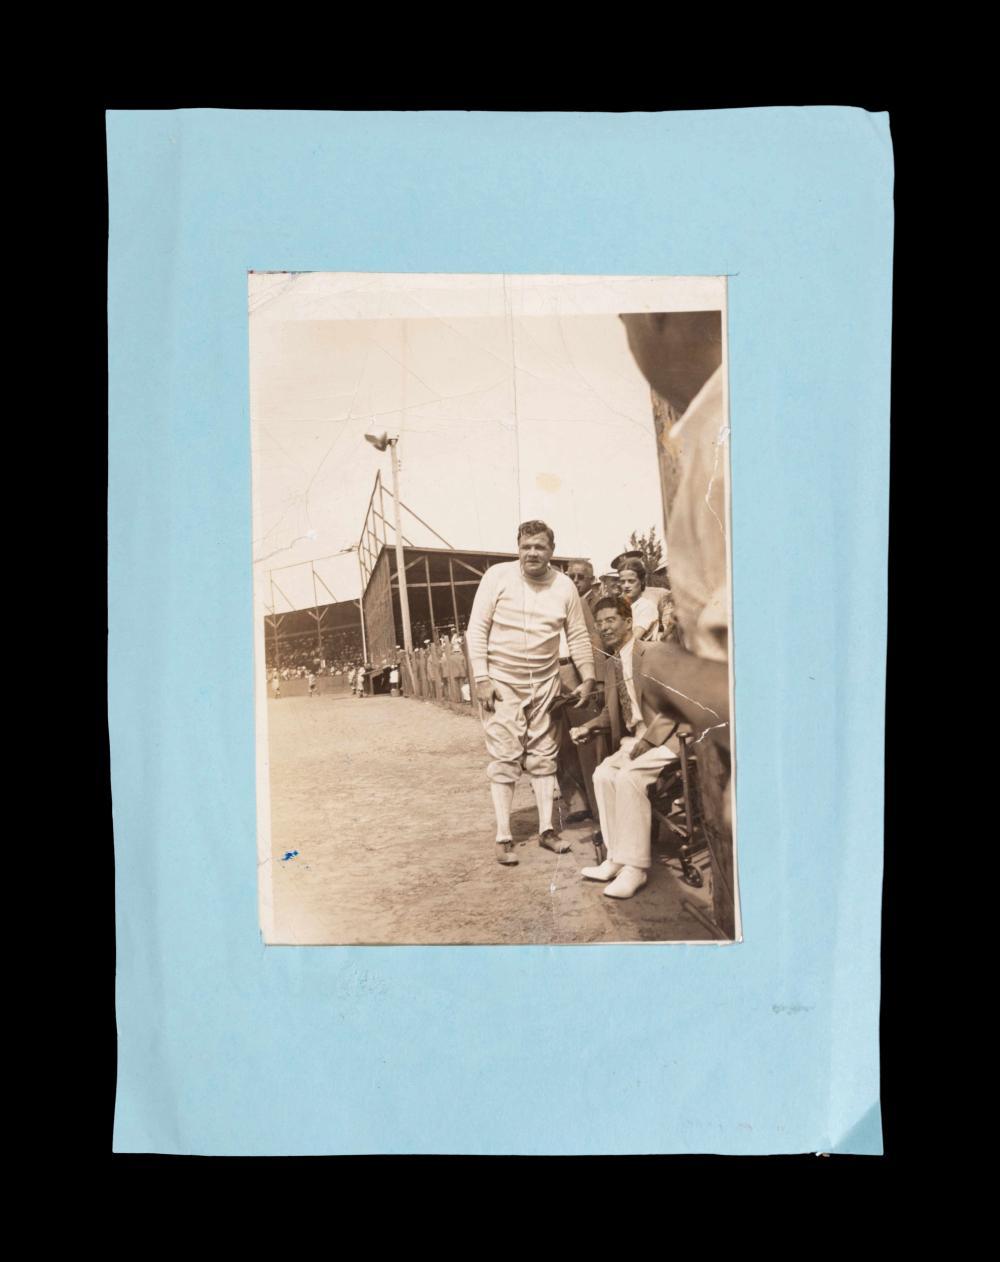 An Original Vintage Babe Ruth Candid Snapshot Photograph,